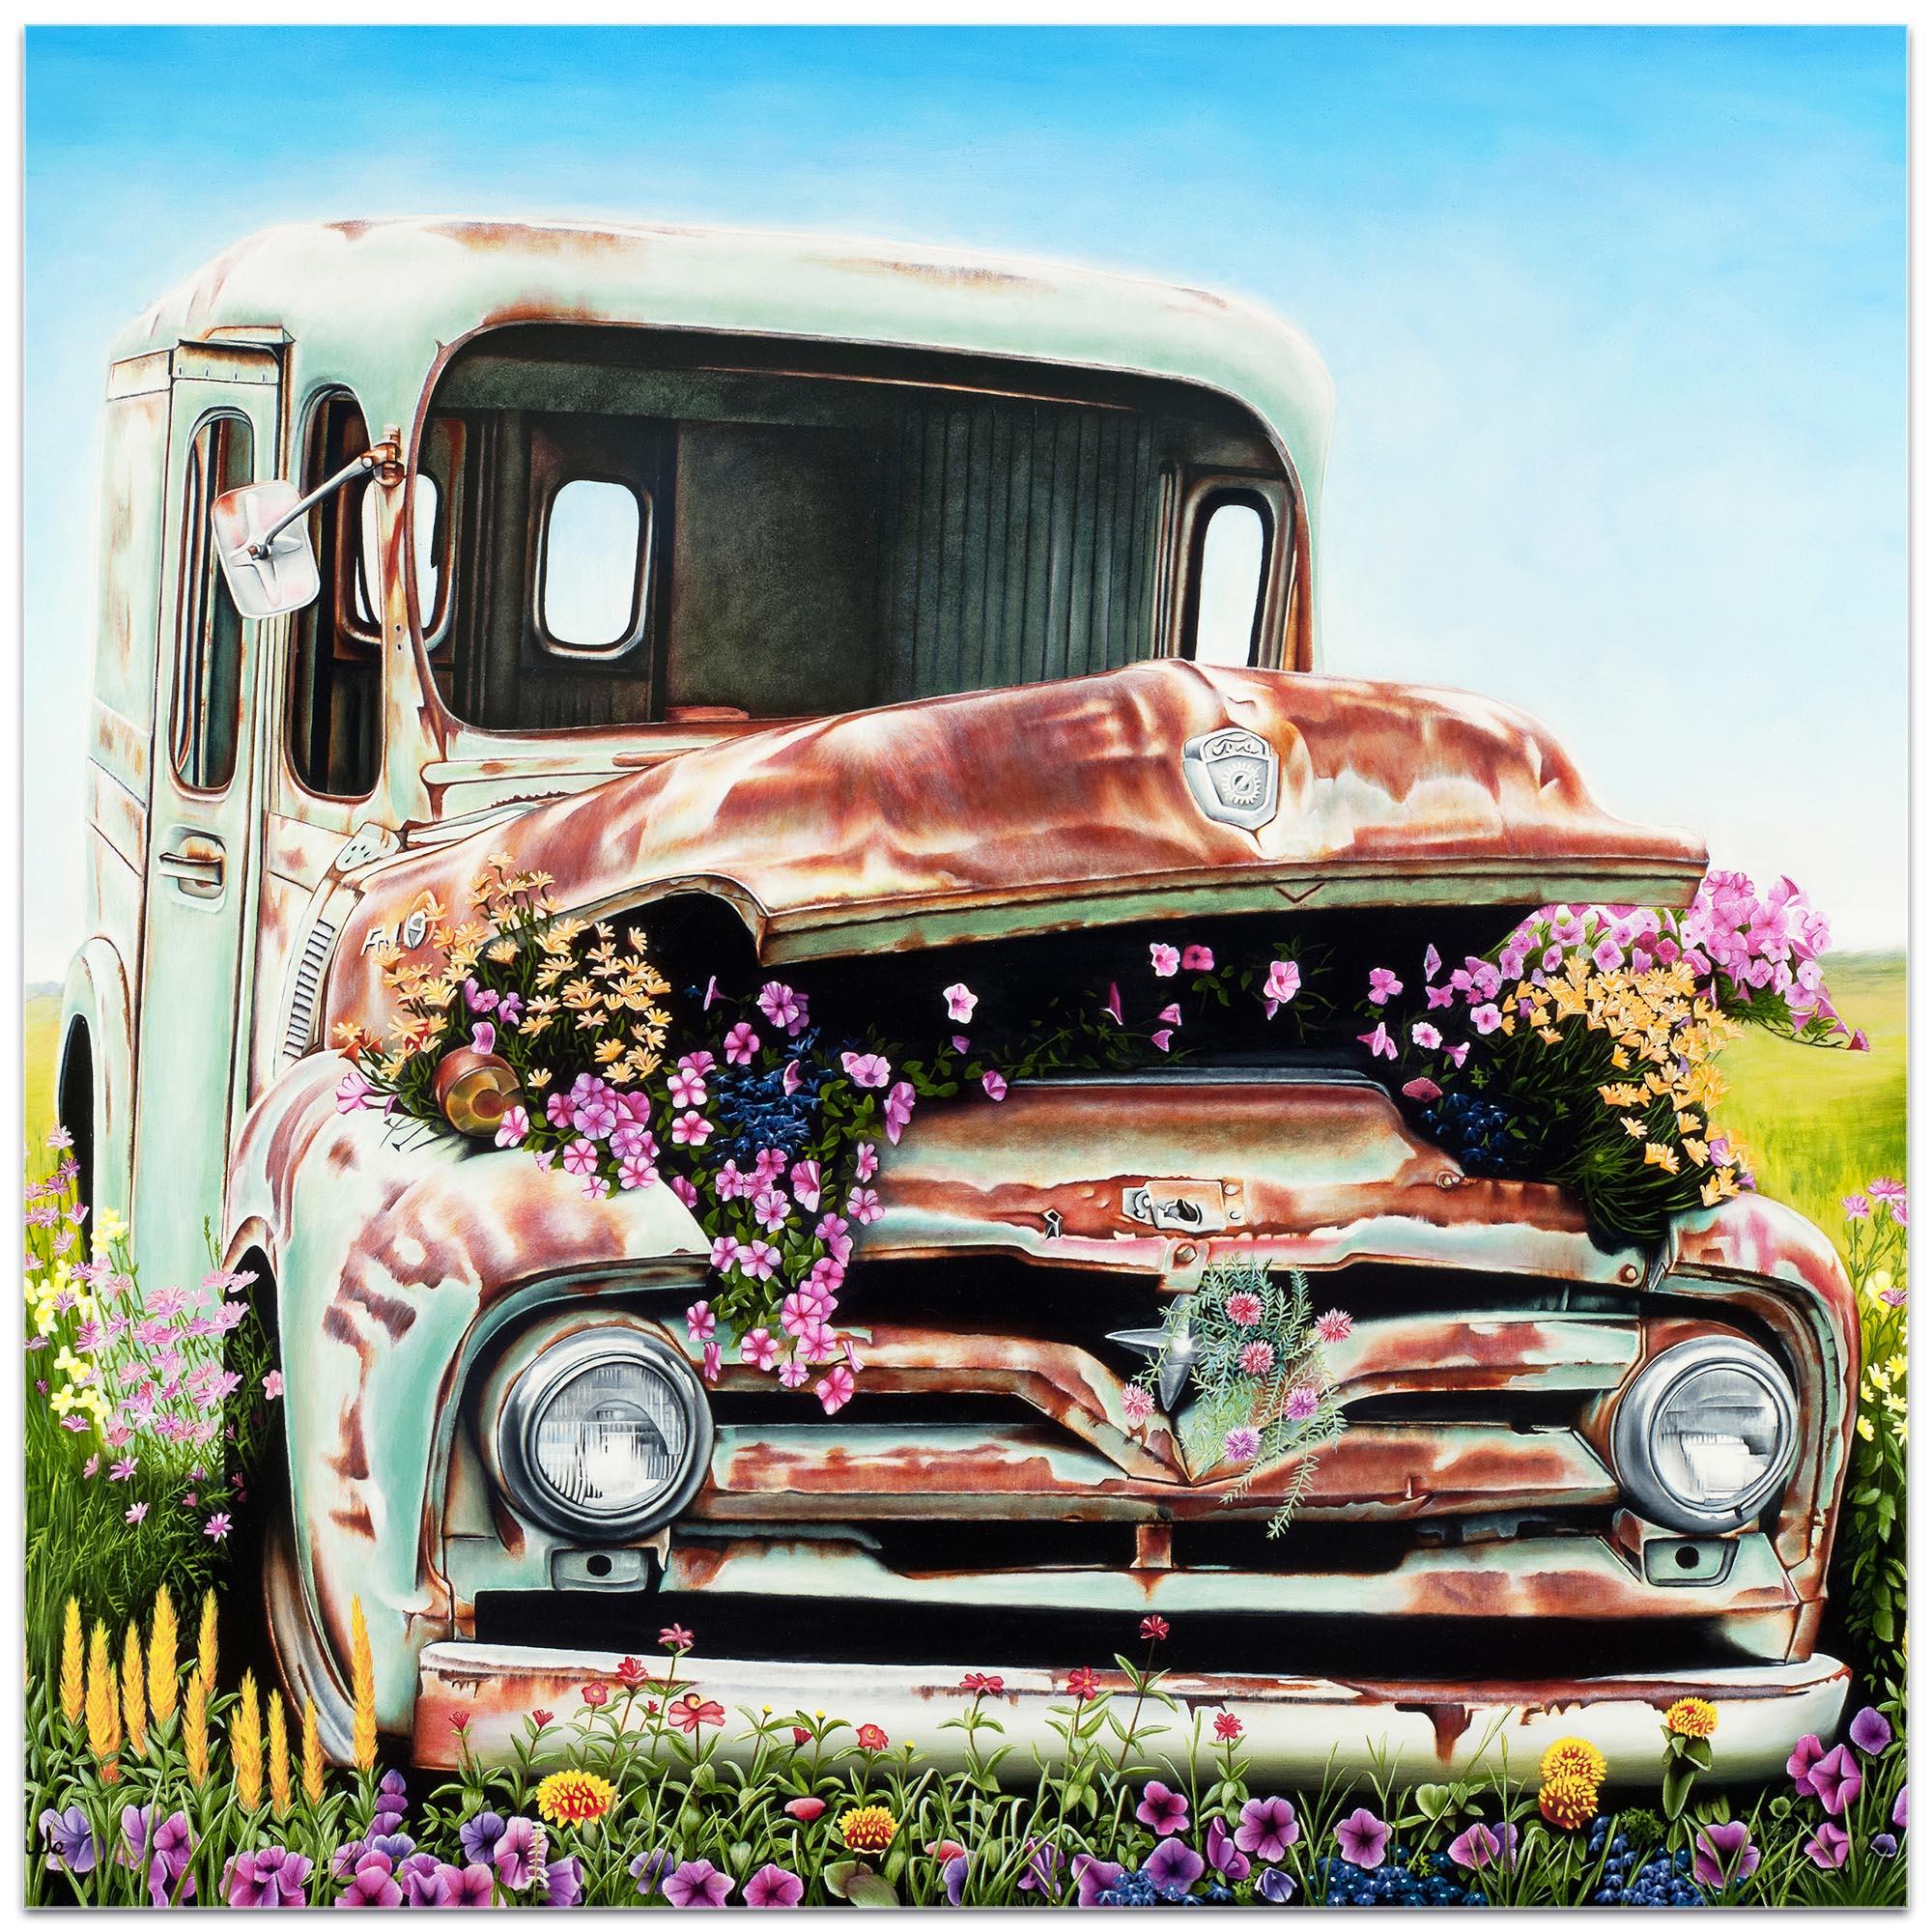 Americana Wall Art 'Got Flowers' - Classic Cars Decor on Metal or Plexiglass - Image 2